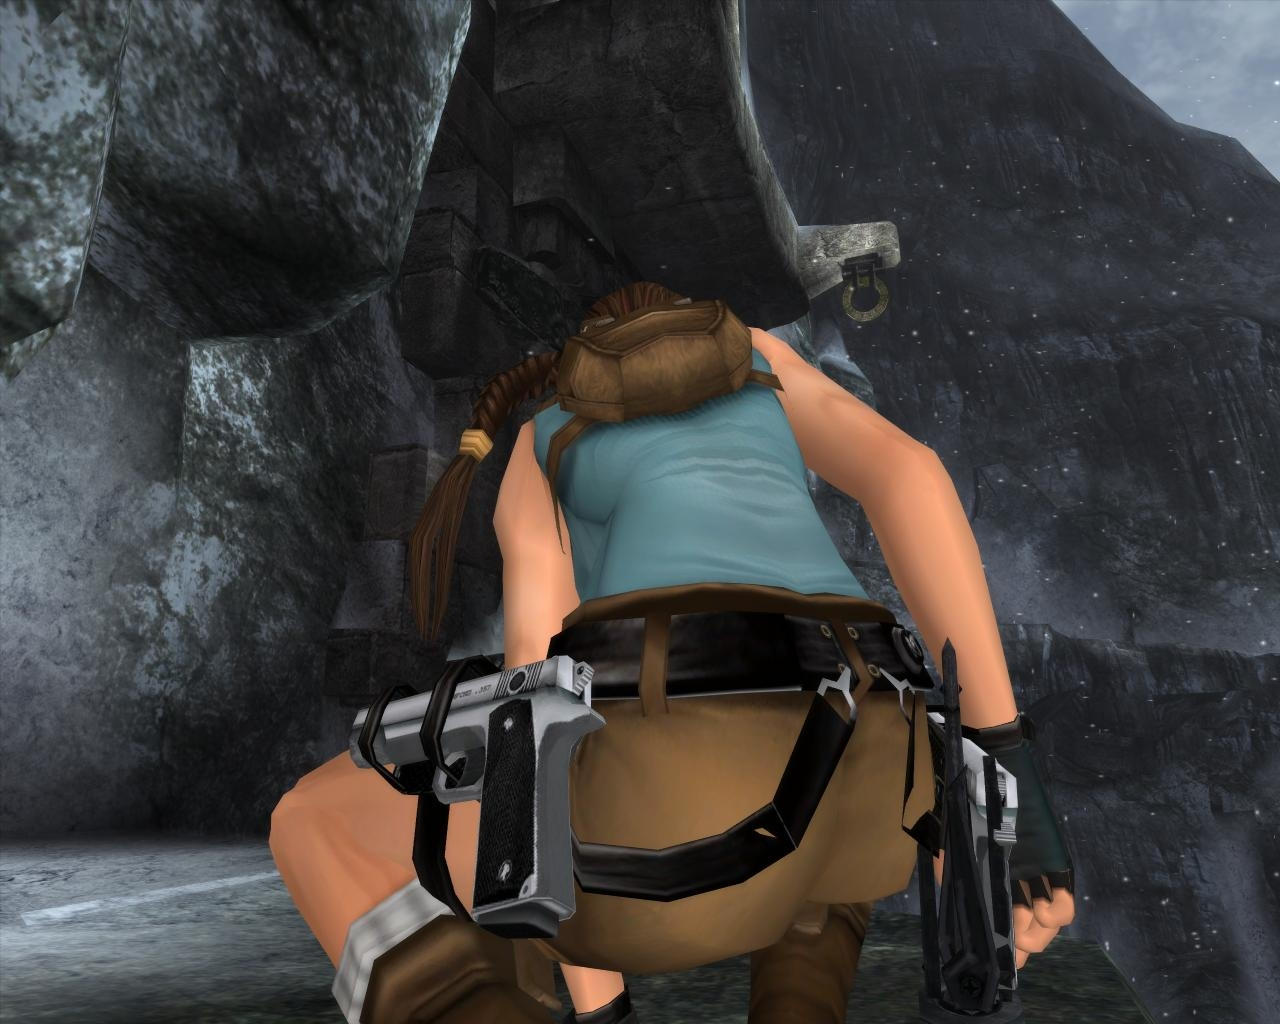 Elves porn vids erotica pictures